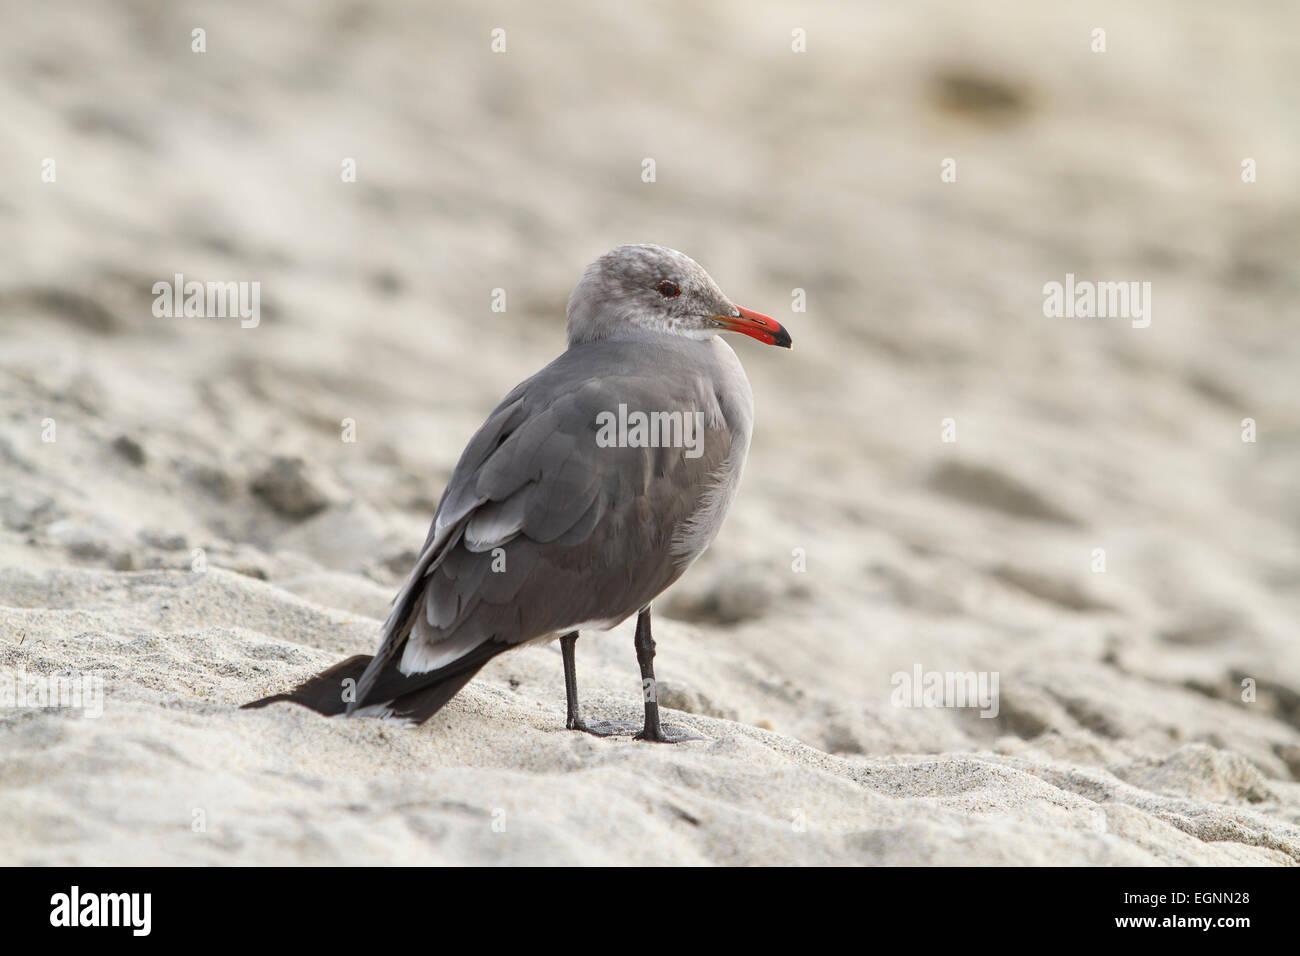 Sea Gull standing on a sandy beach near water. - Stock Image